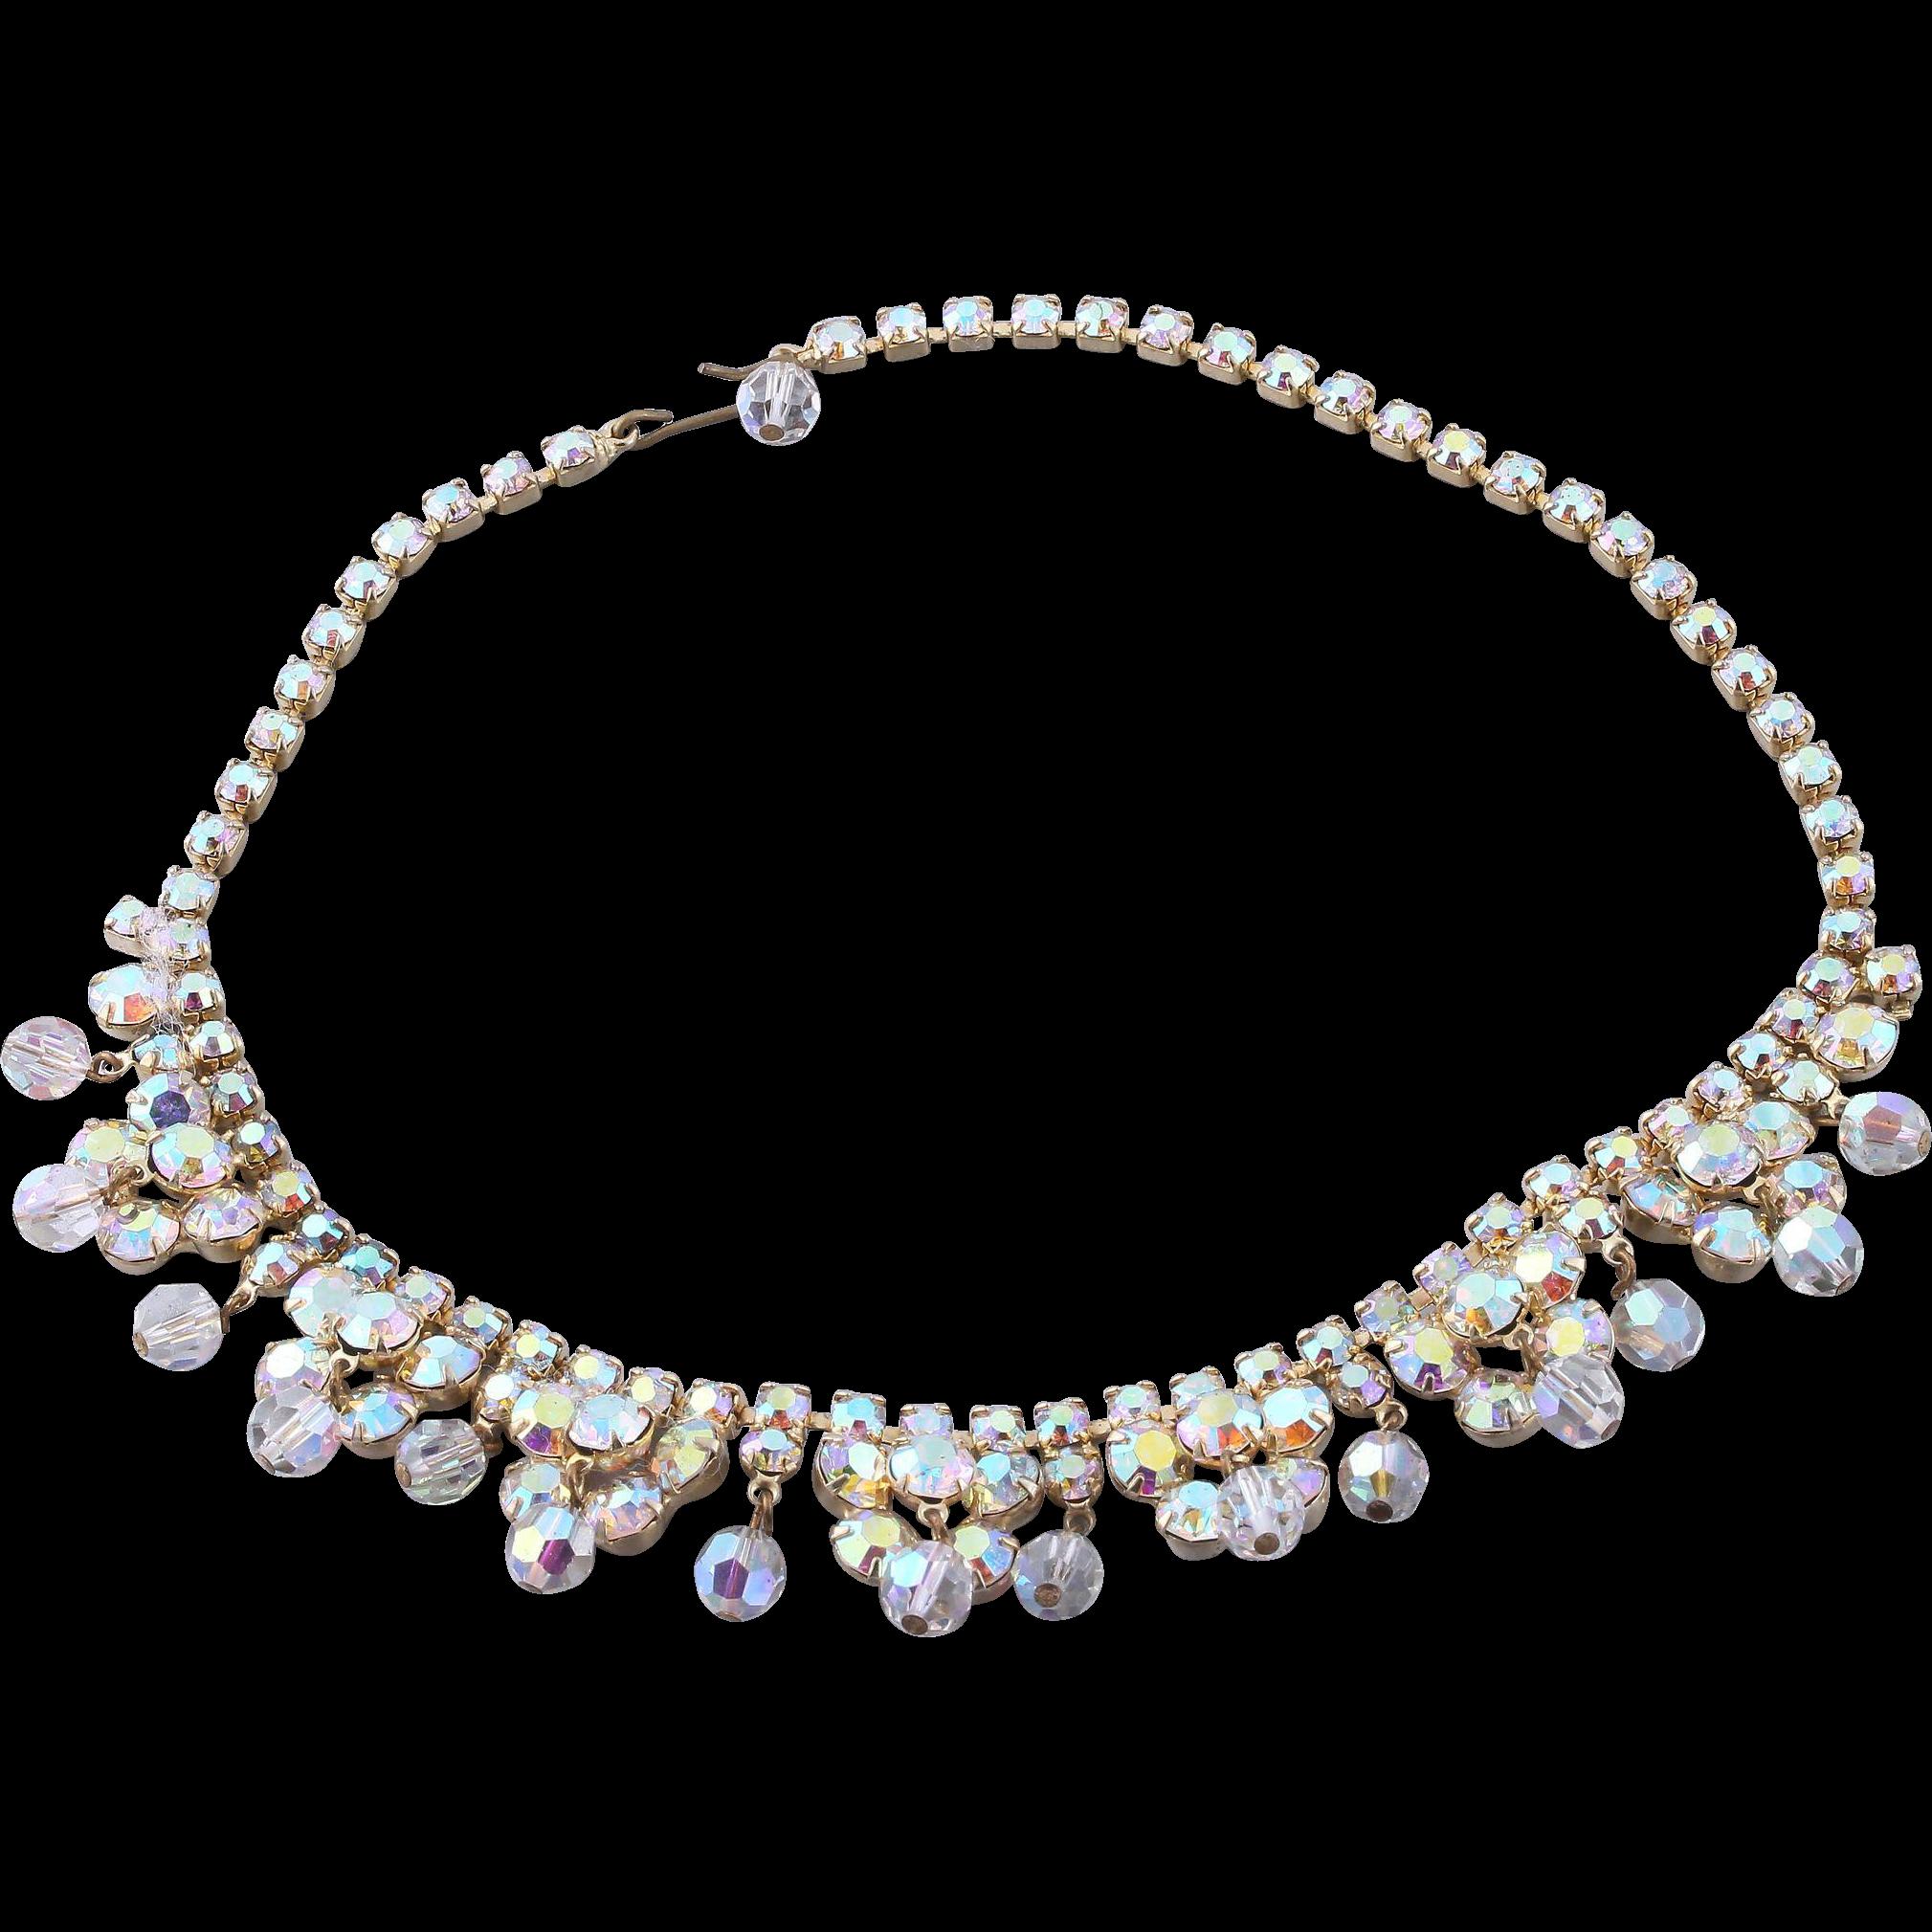 Bridal Vintage Aurora Borealis Bead and Crystal Necklace | Aurora ...